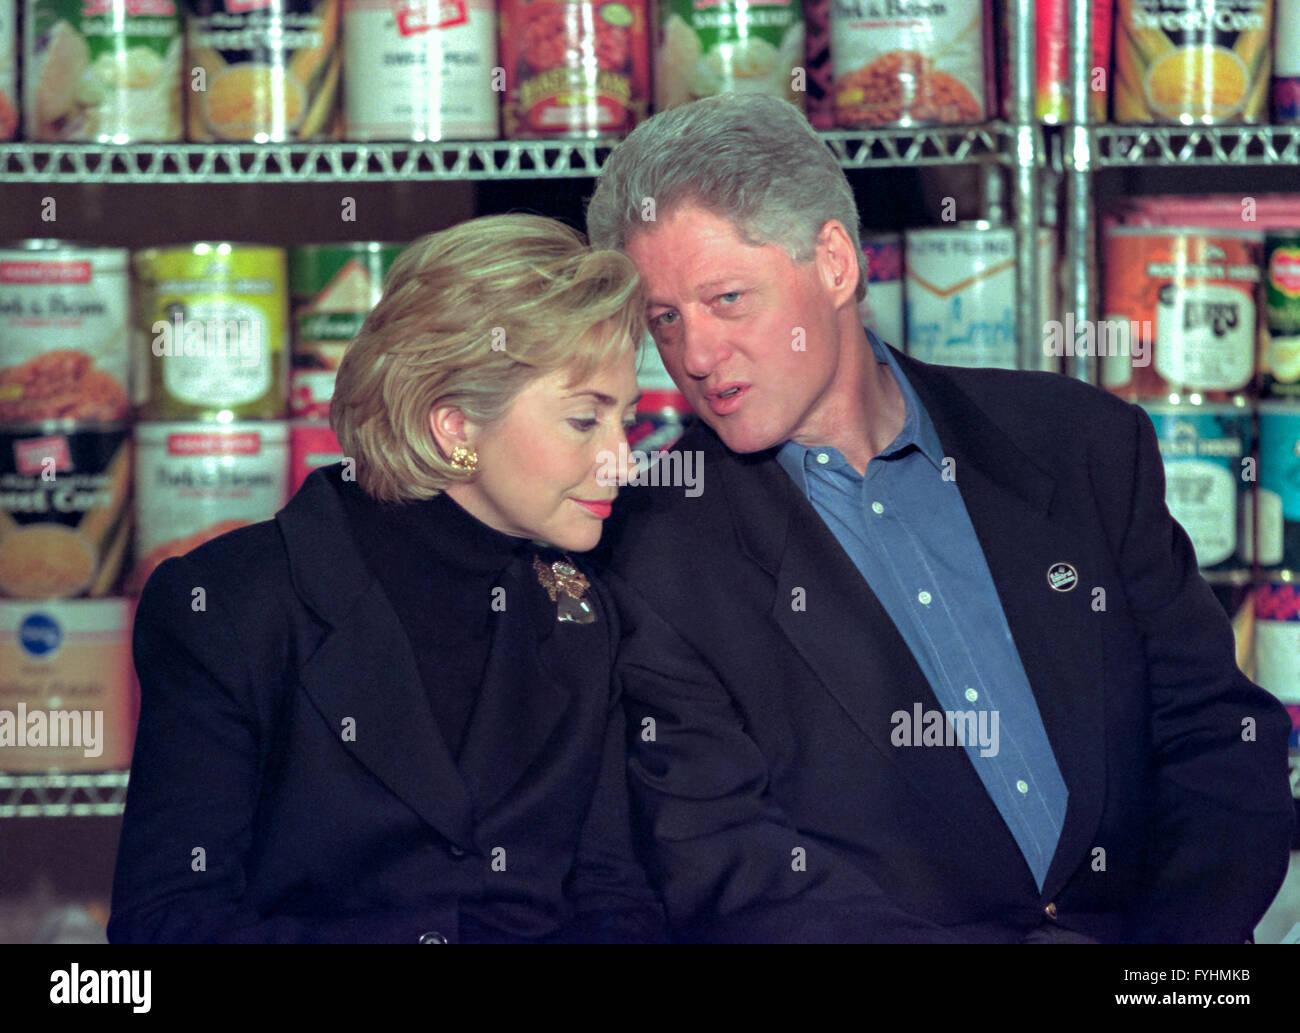 Hillary Rodham Clinton Christmas Stockfotos & Hillary Rodham Clinton ...